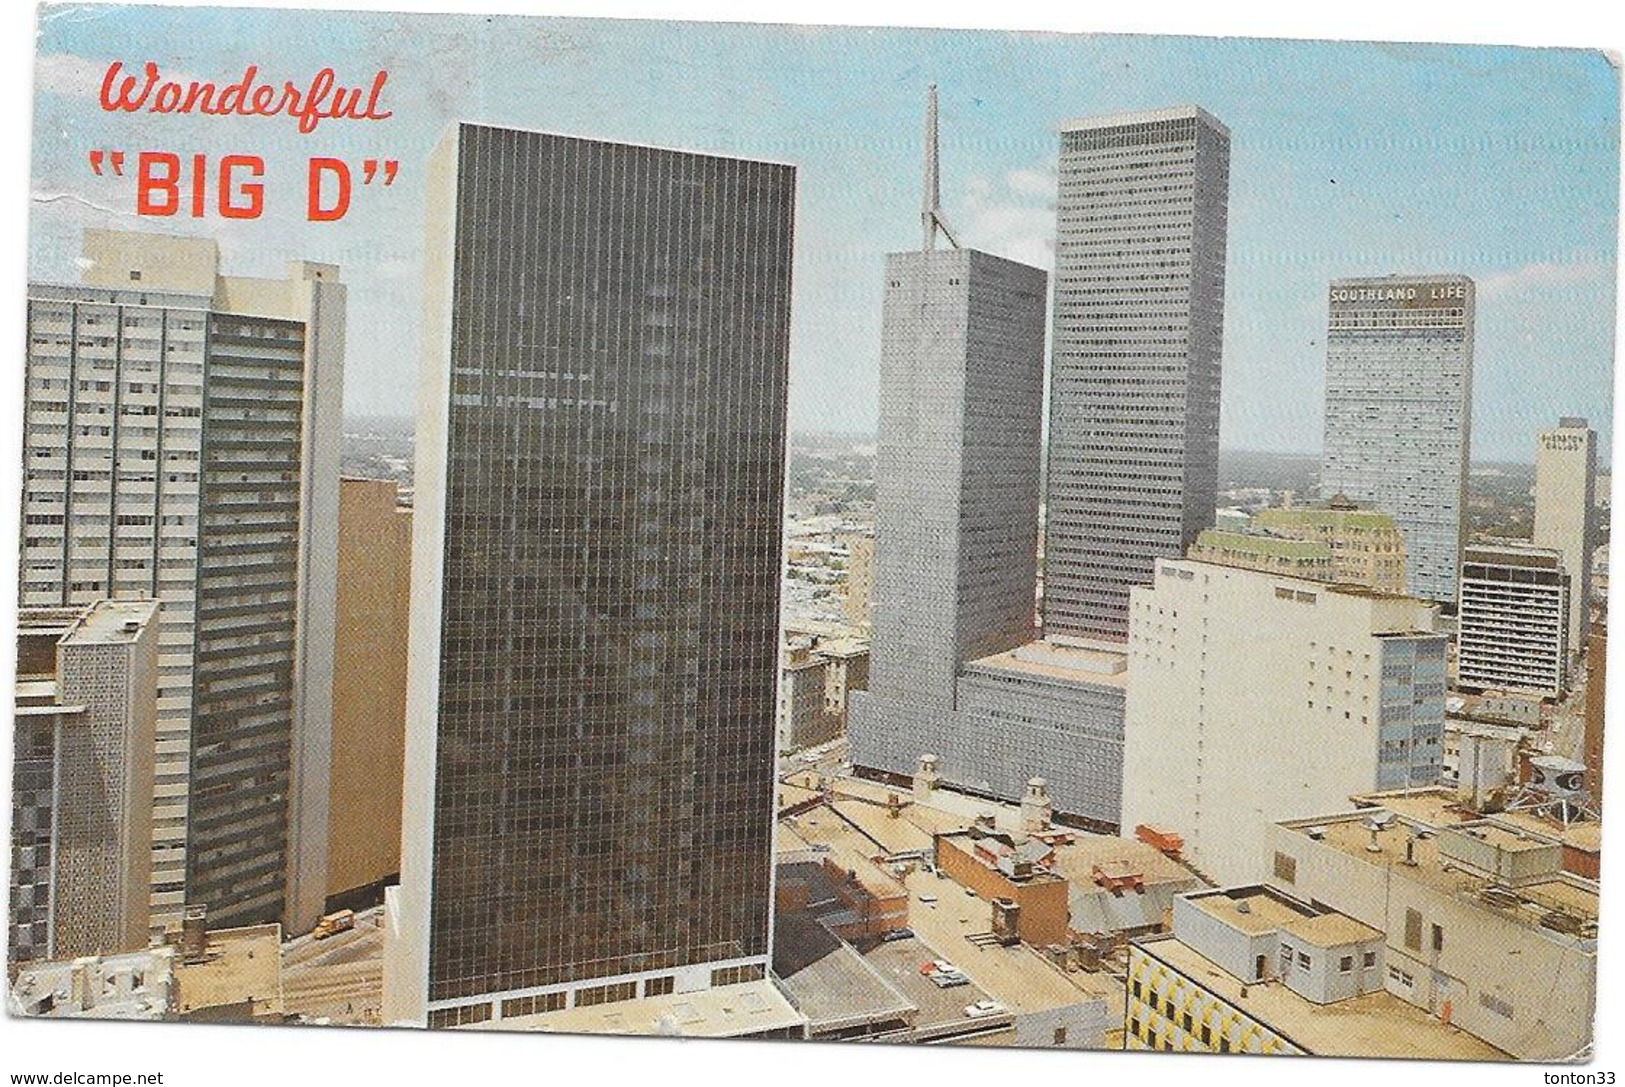 DALLAS  TEXAS  ETATS UNIS - WONDERFUL  BIG D  - NANT** - - Dallas